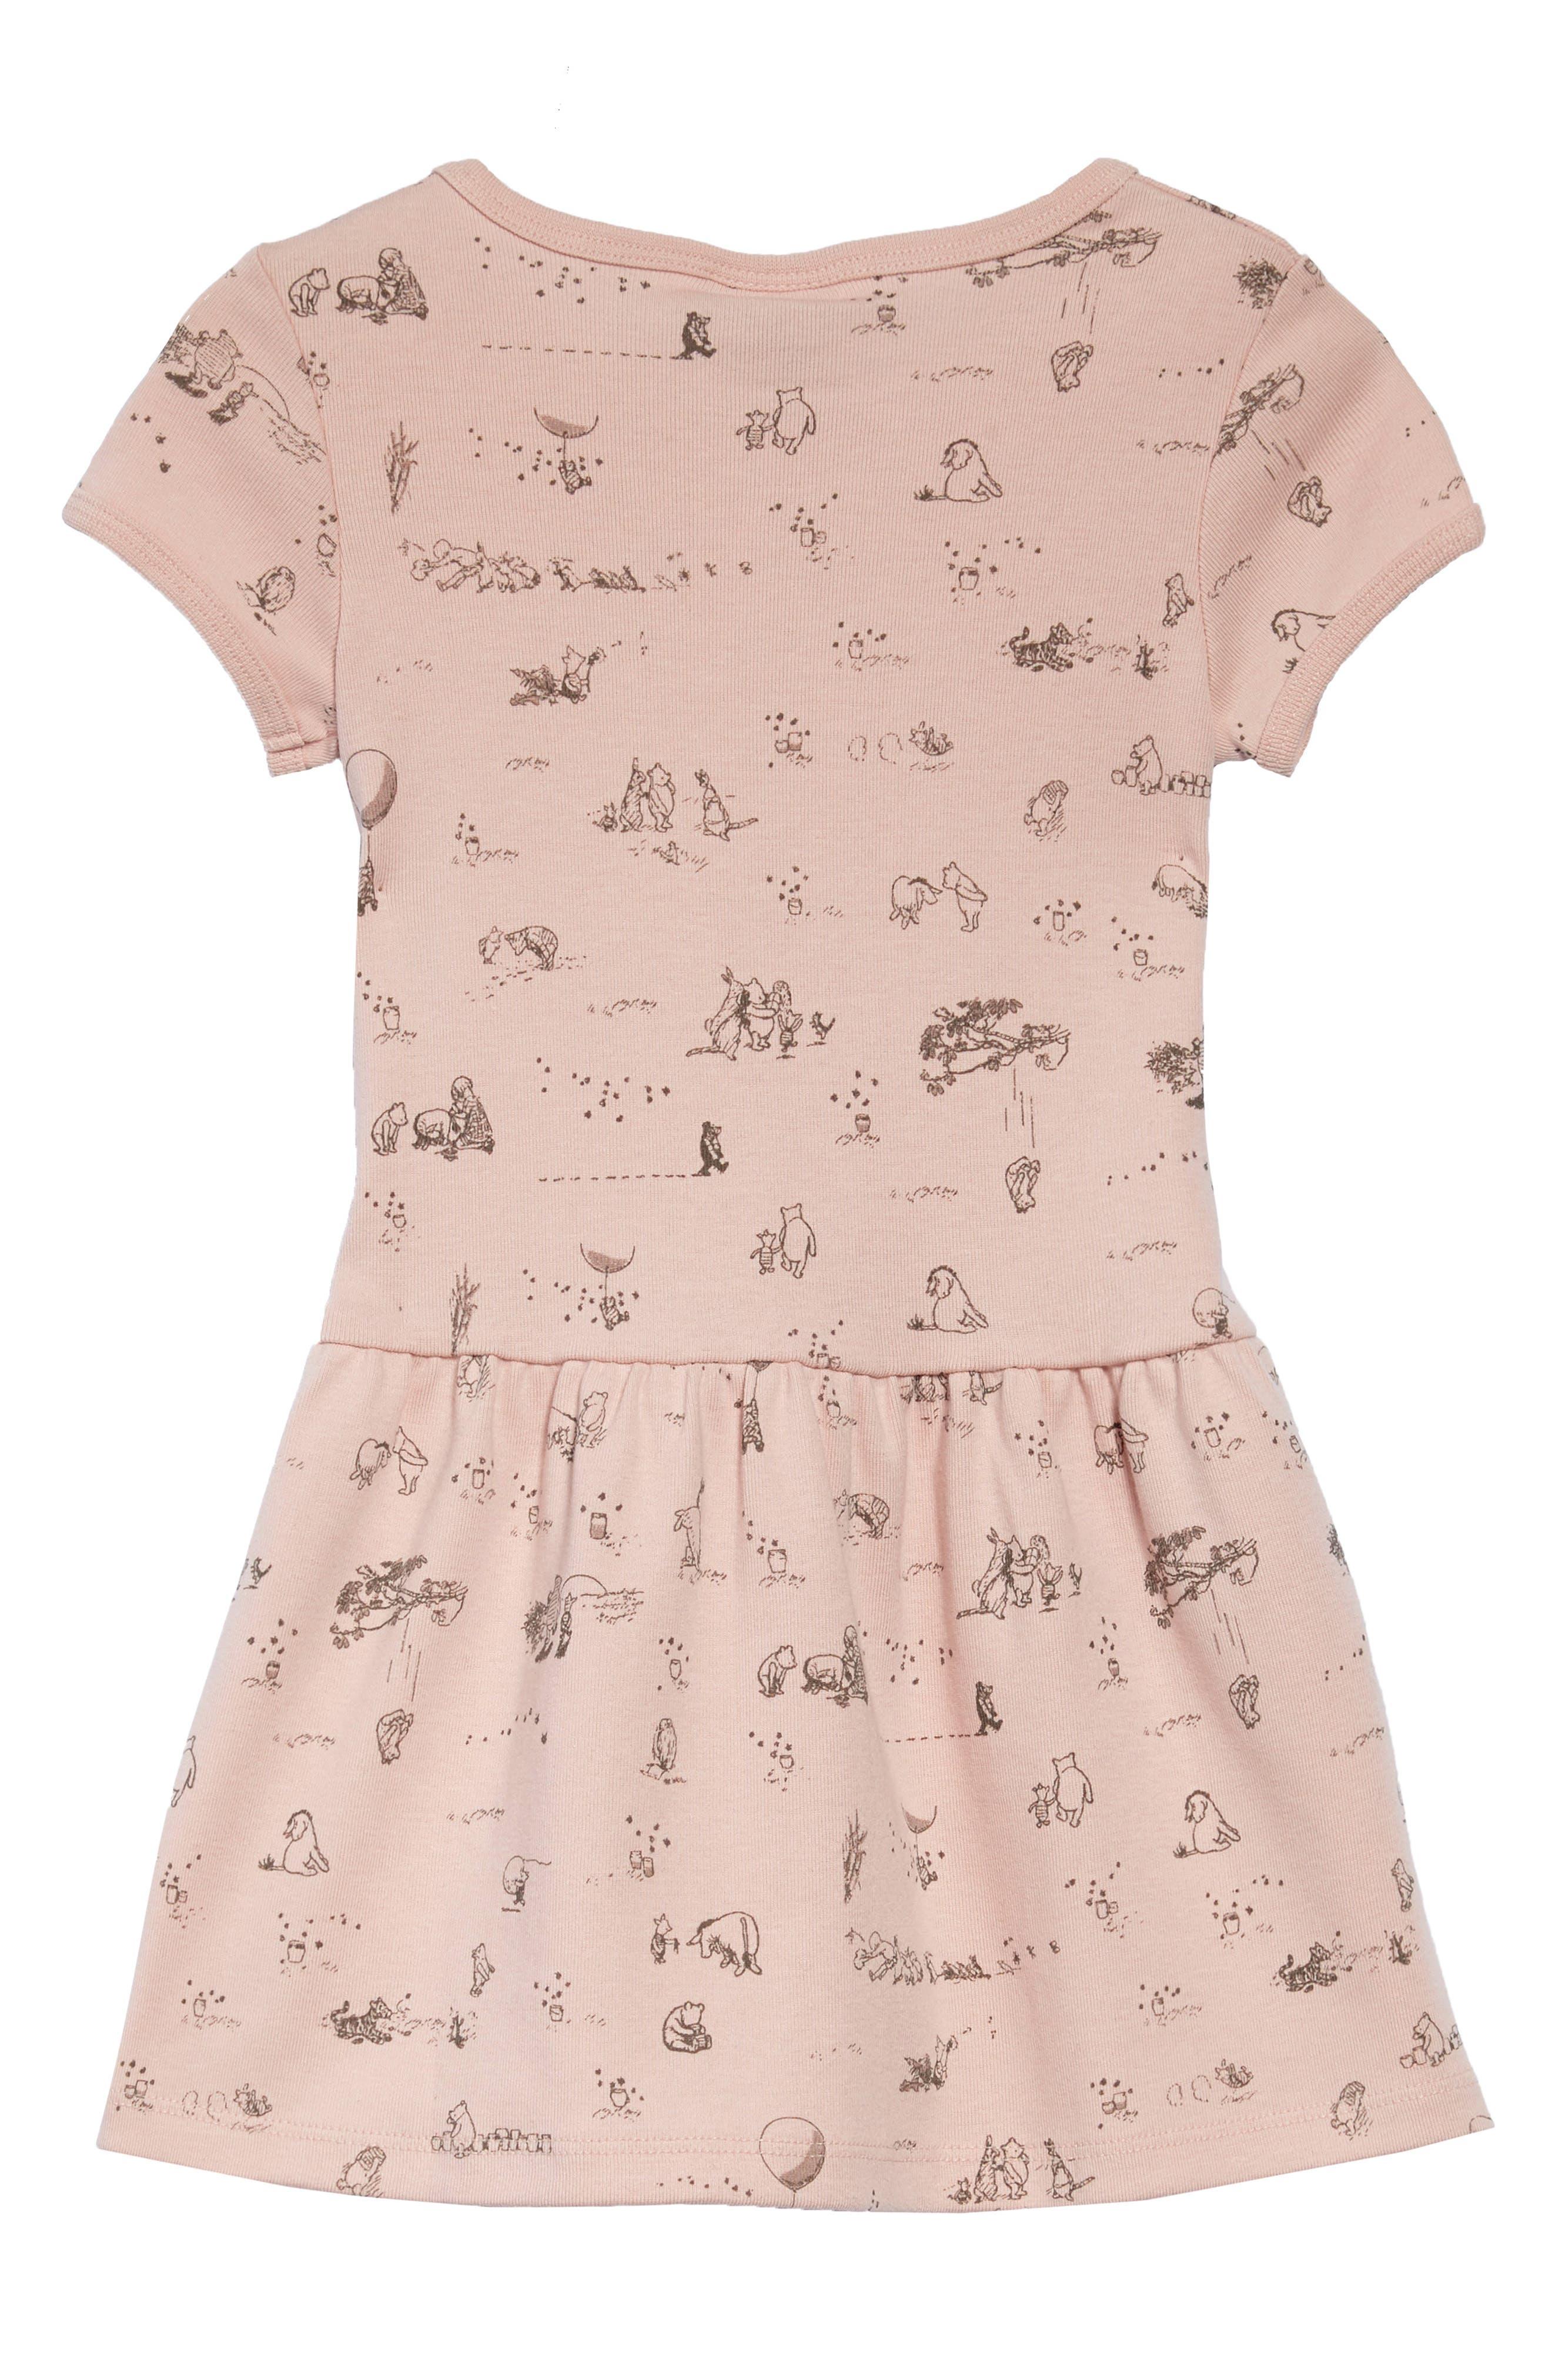 x Disney<sup>®</sup> Winnie the Pooh Print Dress,                             Alternate thumbnail 2, color,                             651